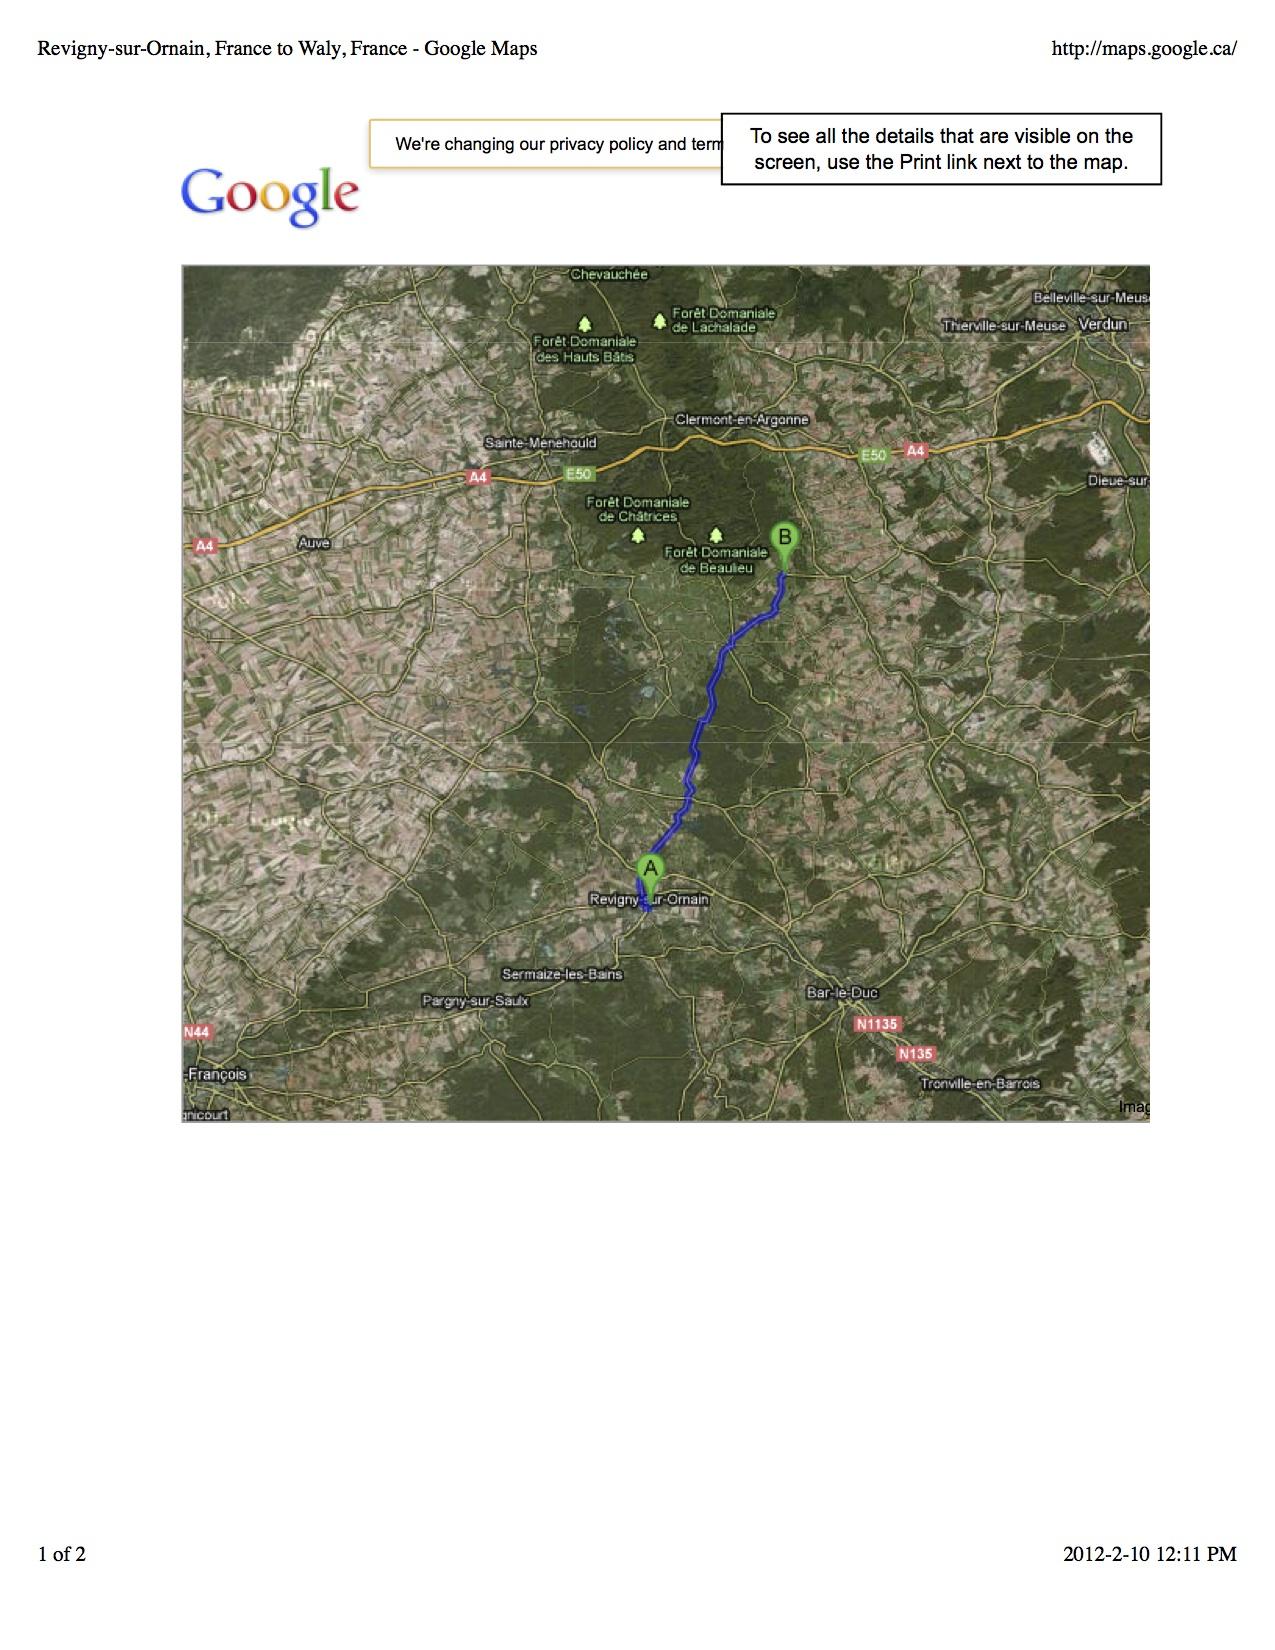 Revigny-sur-Ornain, France to Waly, France - Google Maps